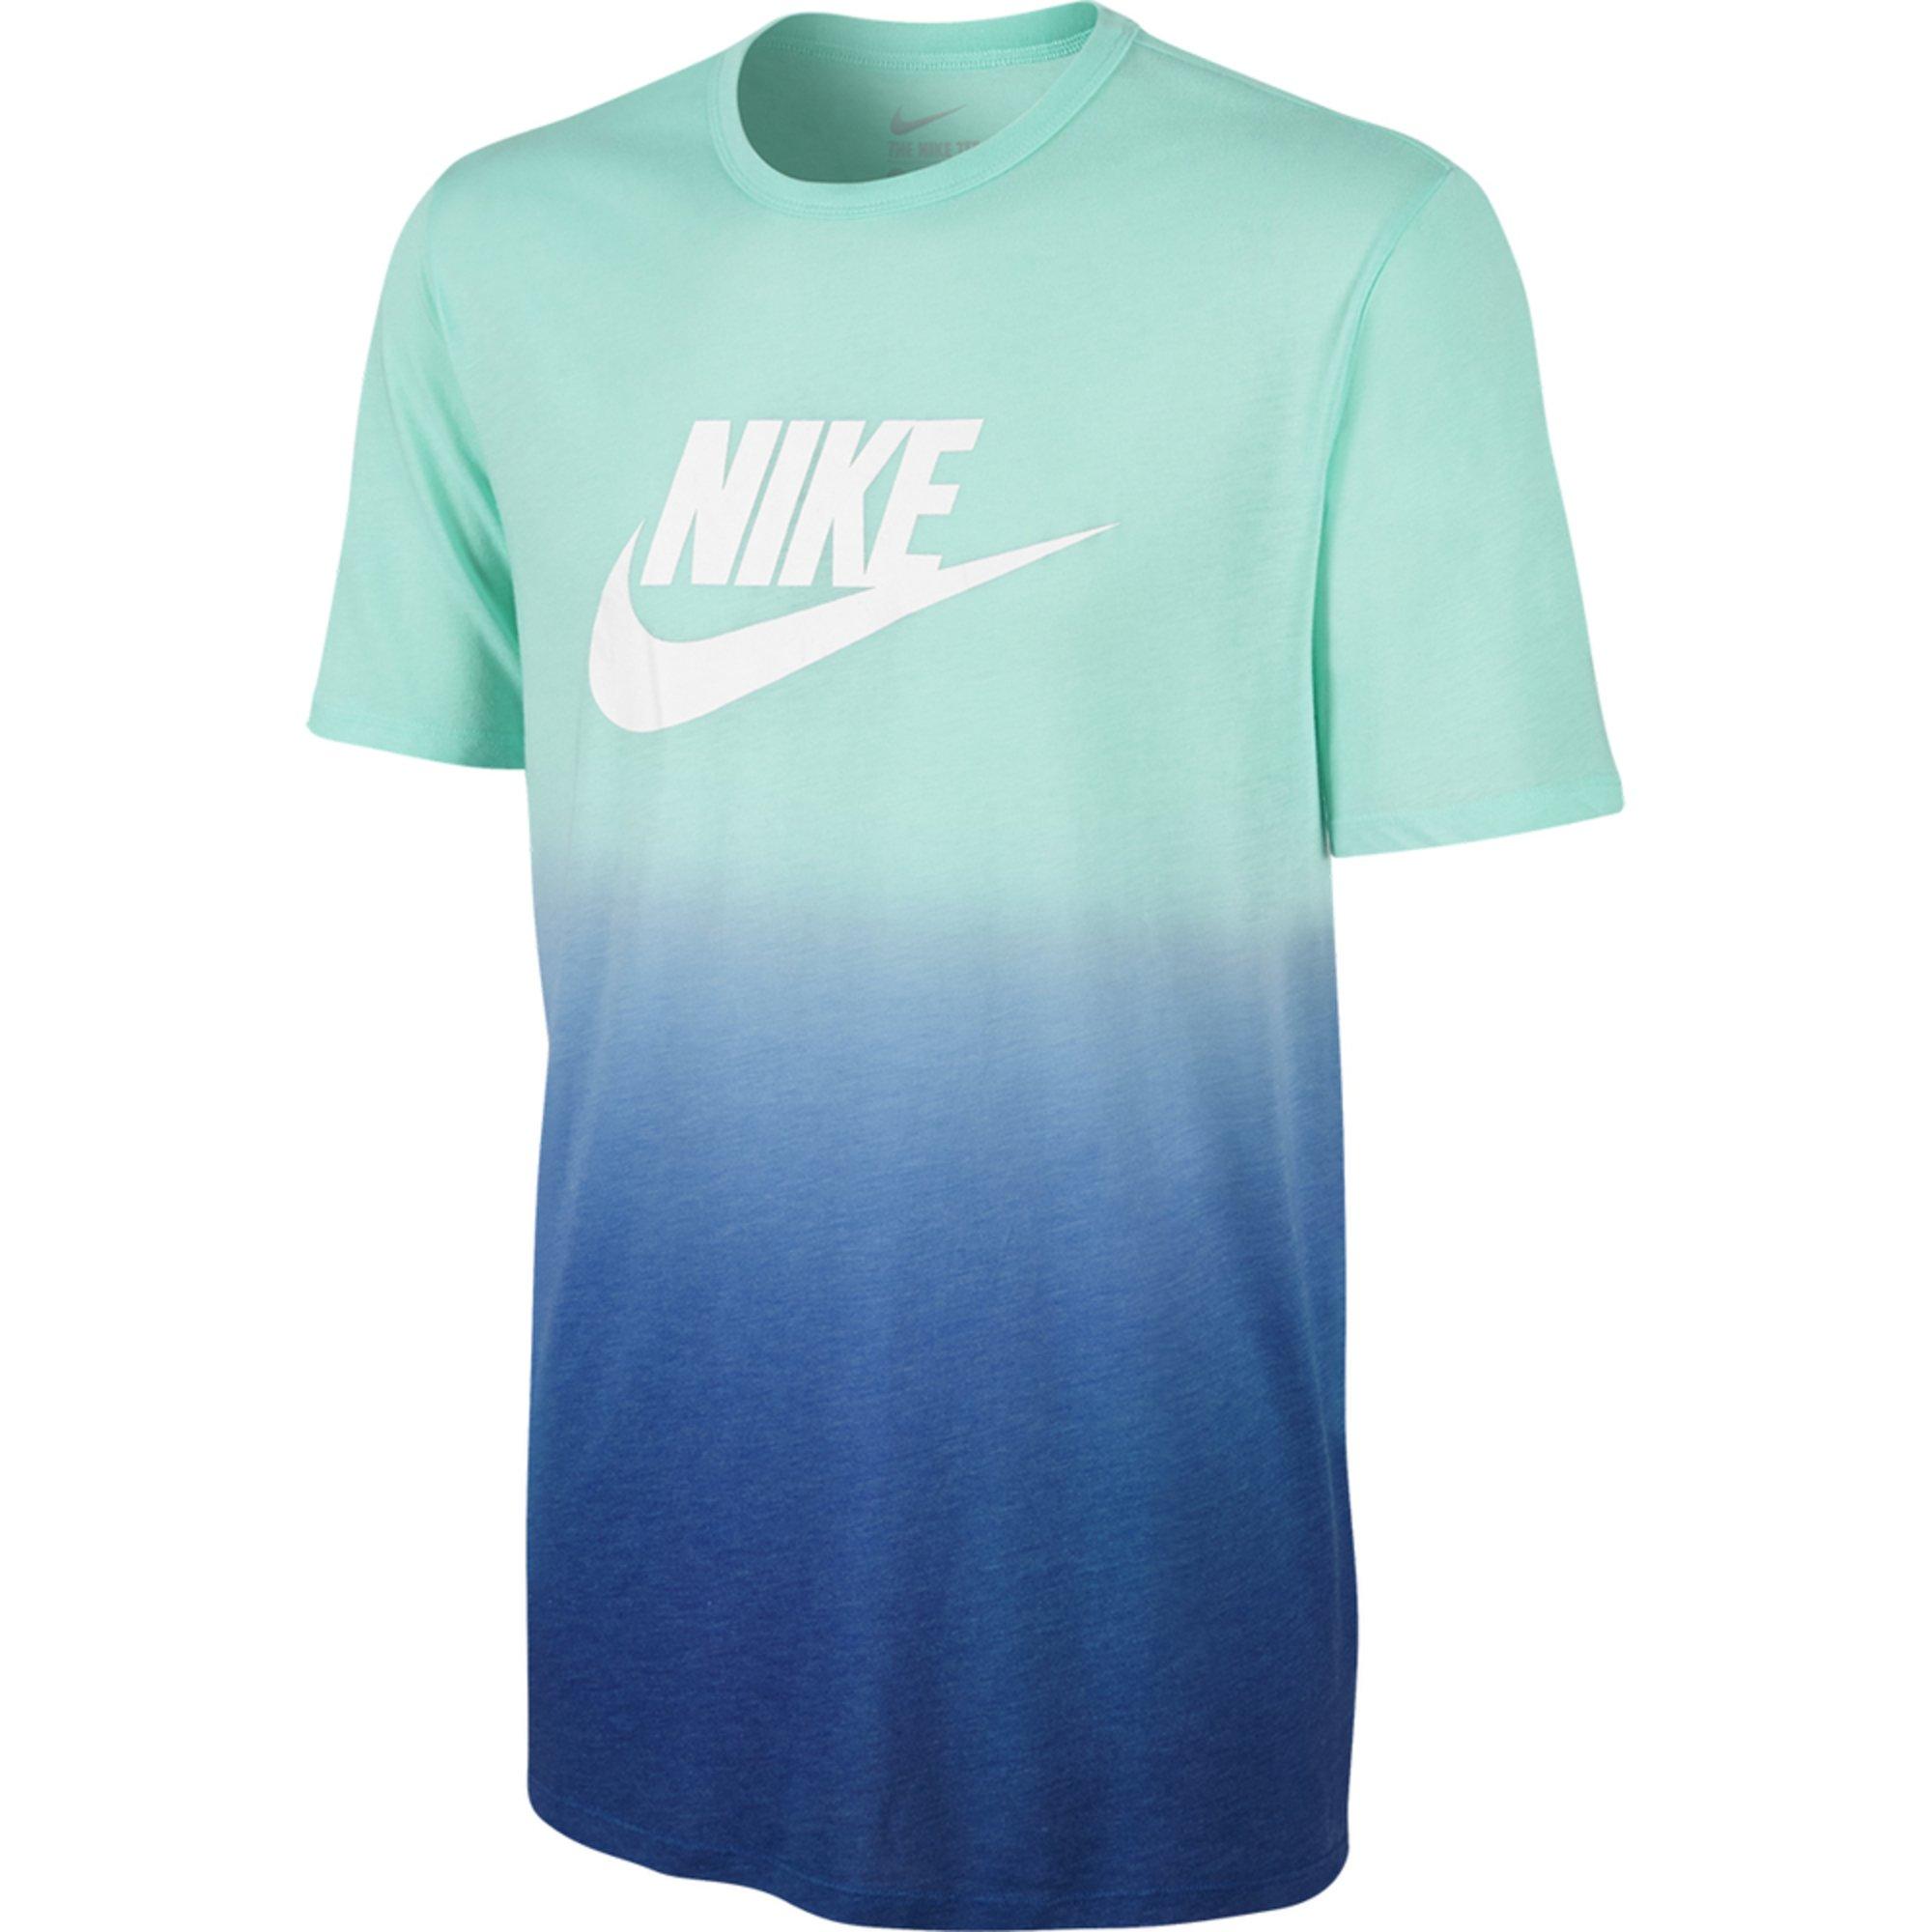 Nike tee dip dye futura men 39 s training t shirt men for Mens dip dye shirt